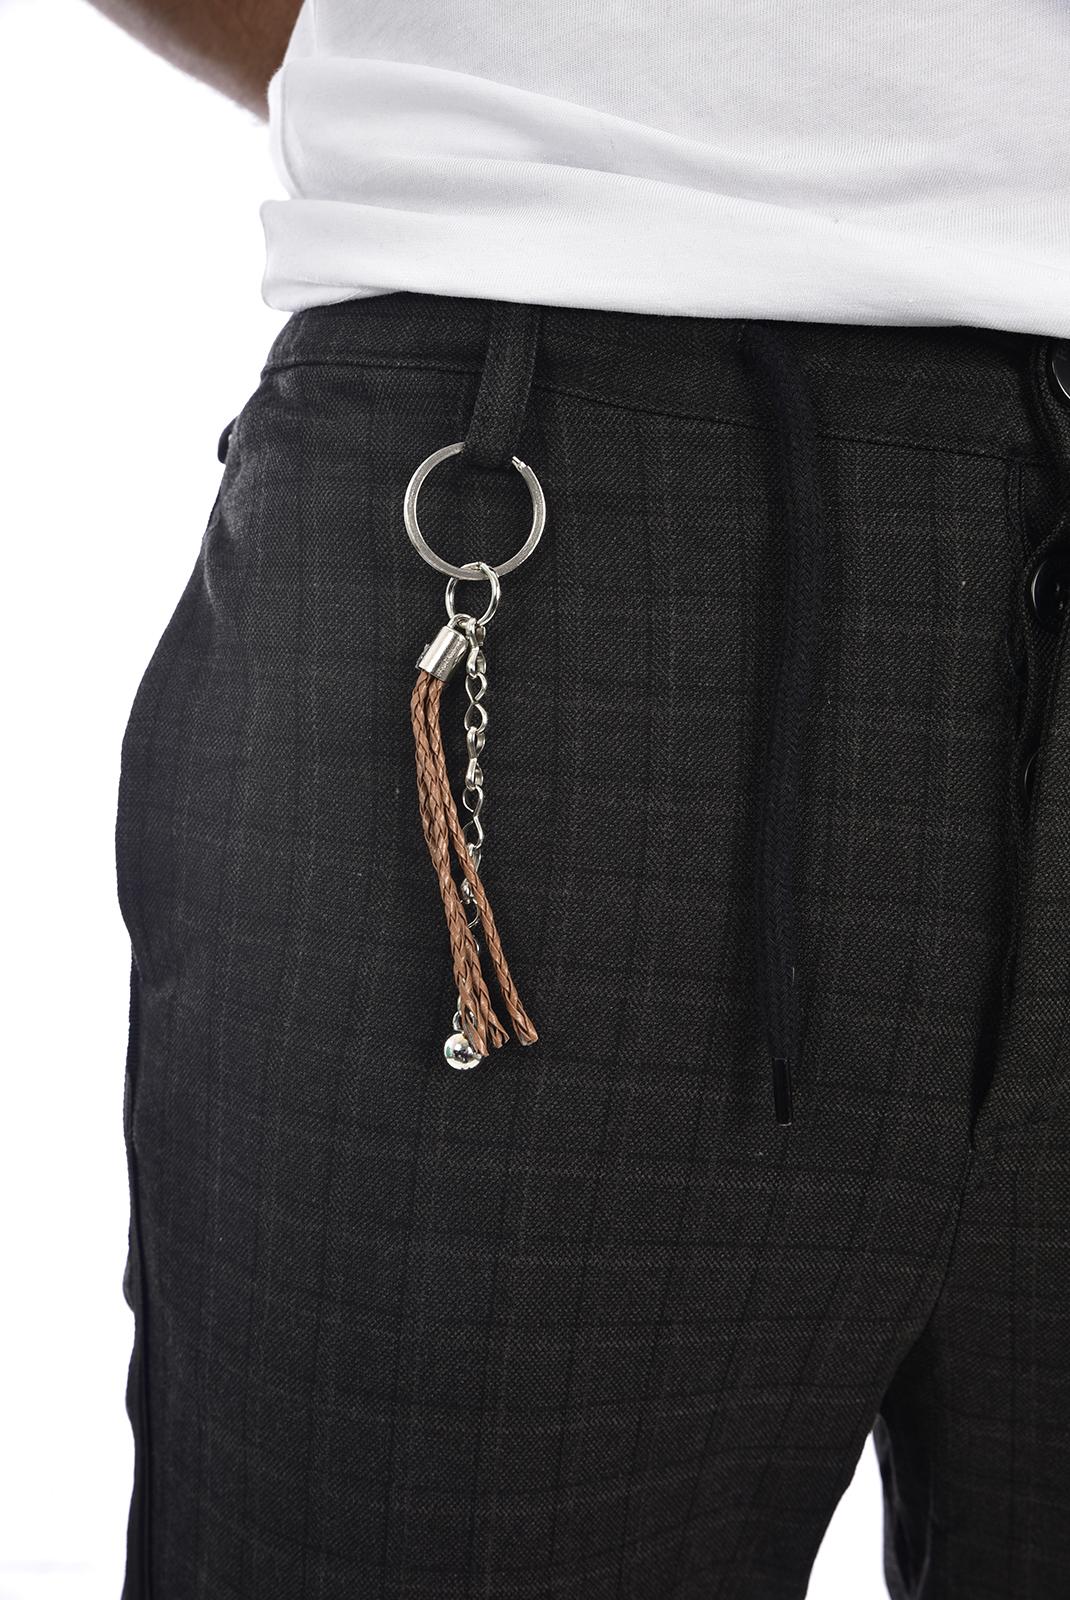 Pantalons chino/citadin  Goldenim paris 1353 GRIS FONCE